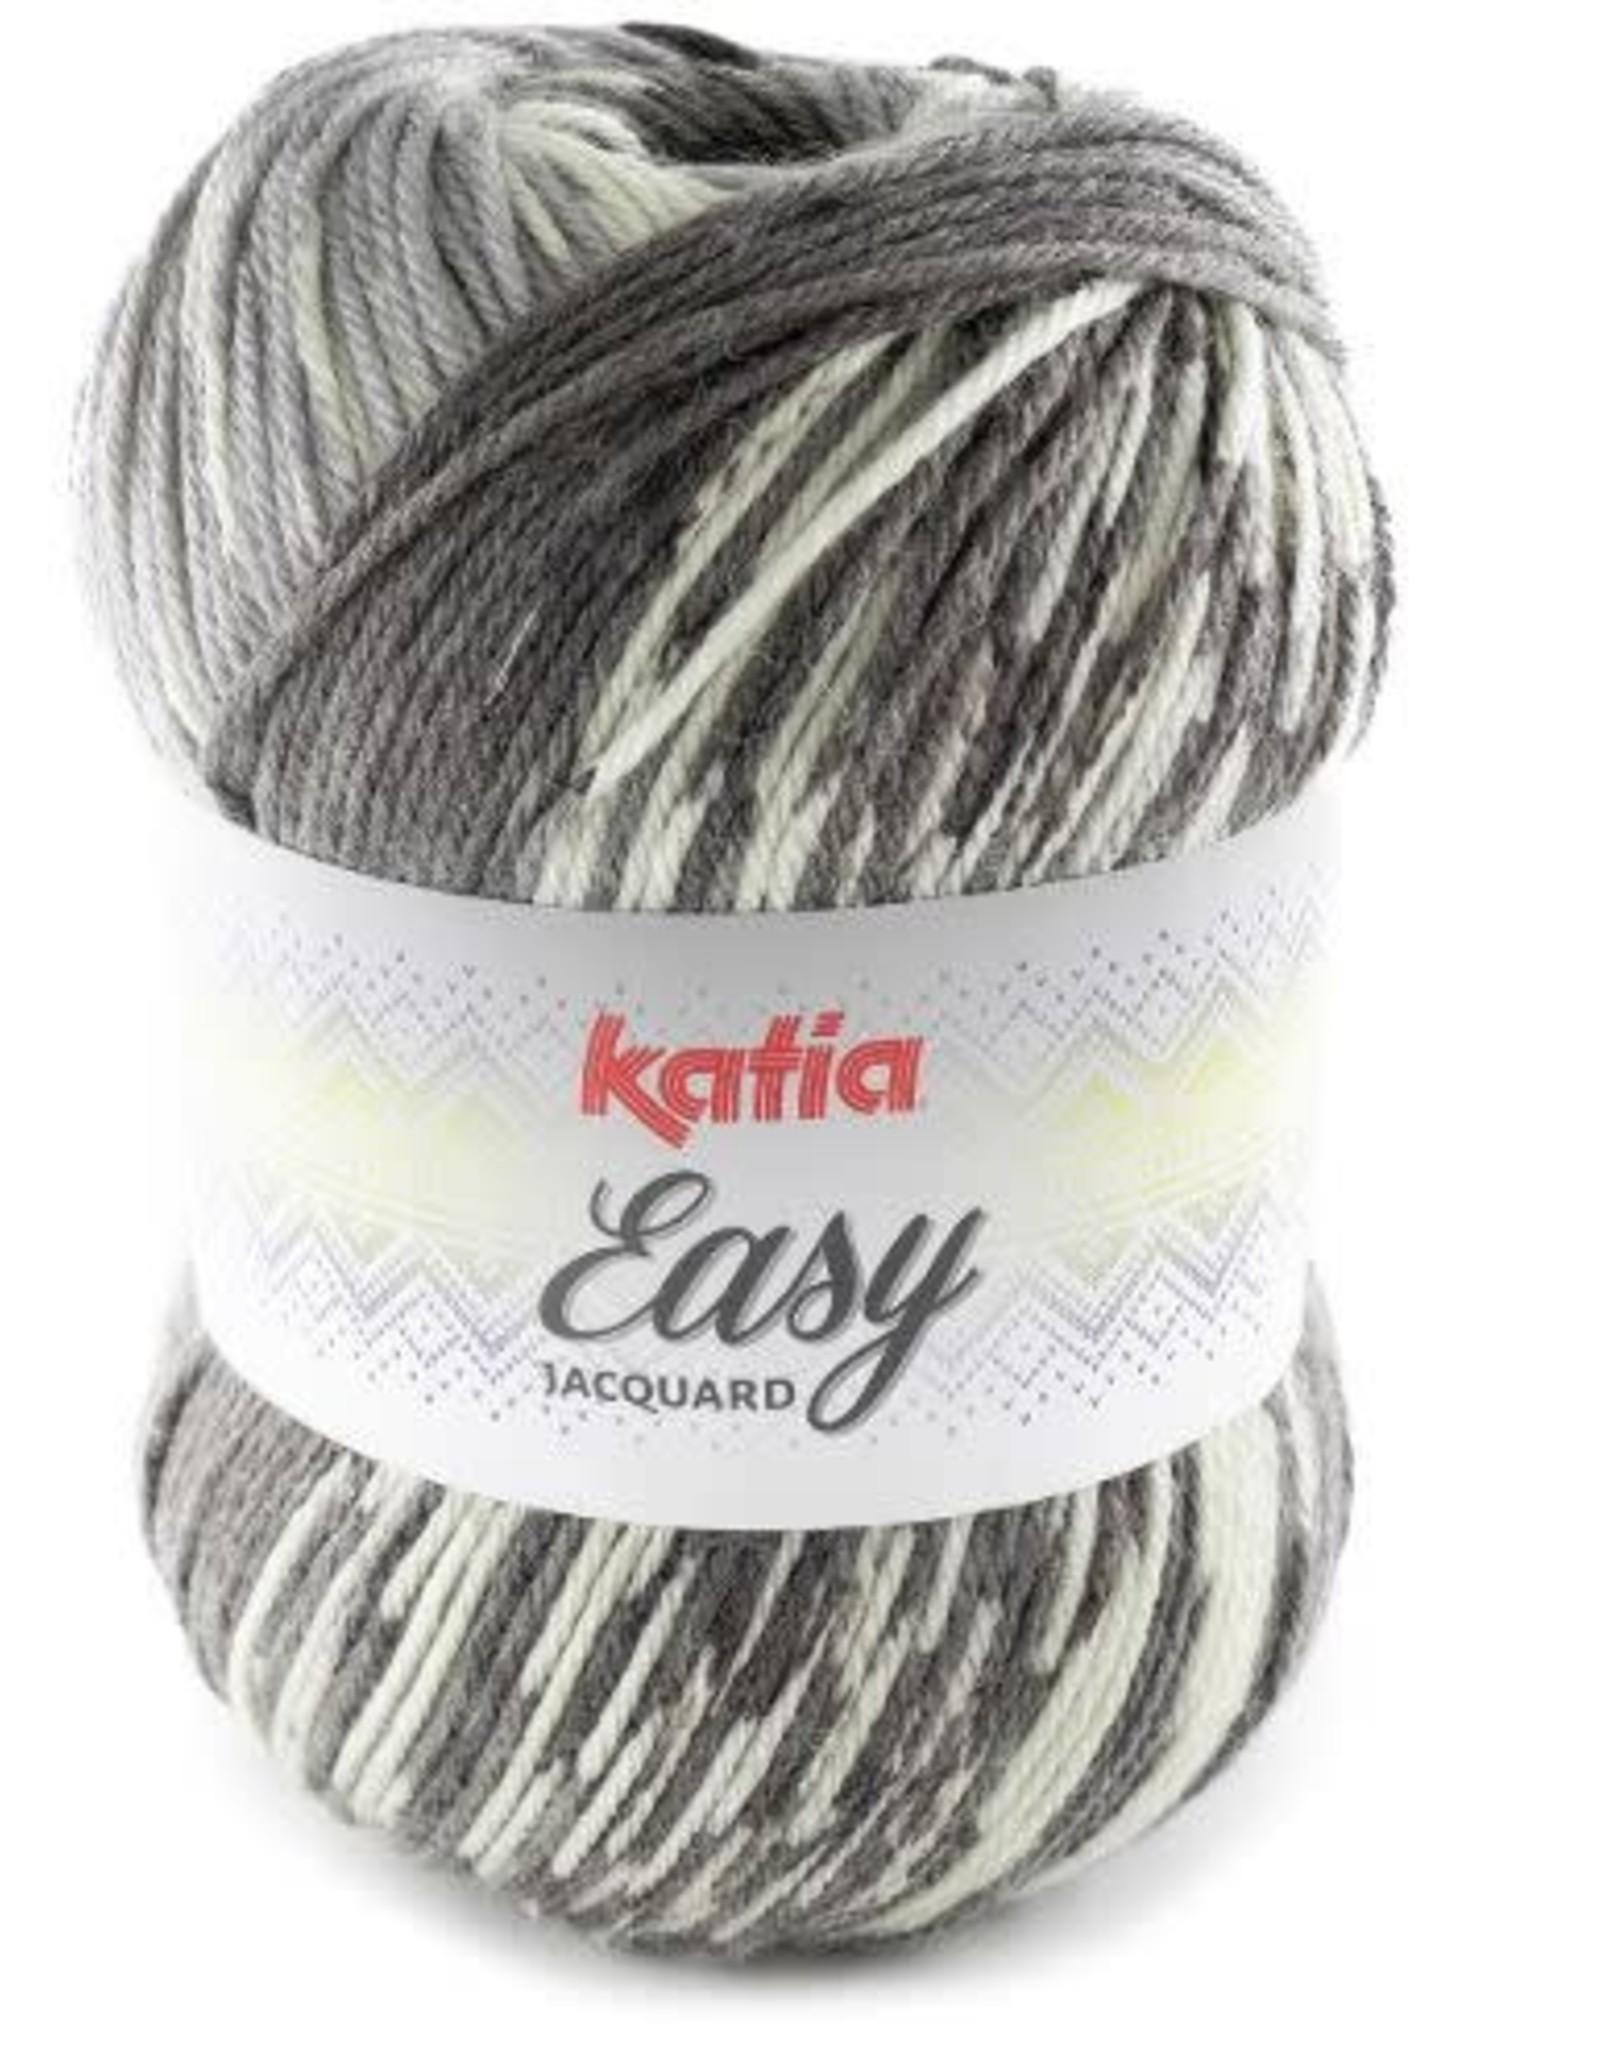 Katia Garen Easy Jacquard 308 grijs-antraciet